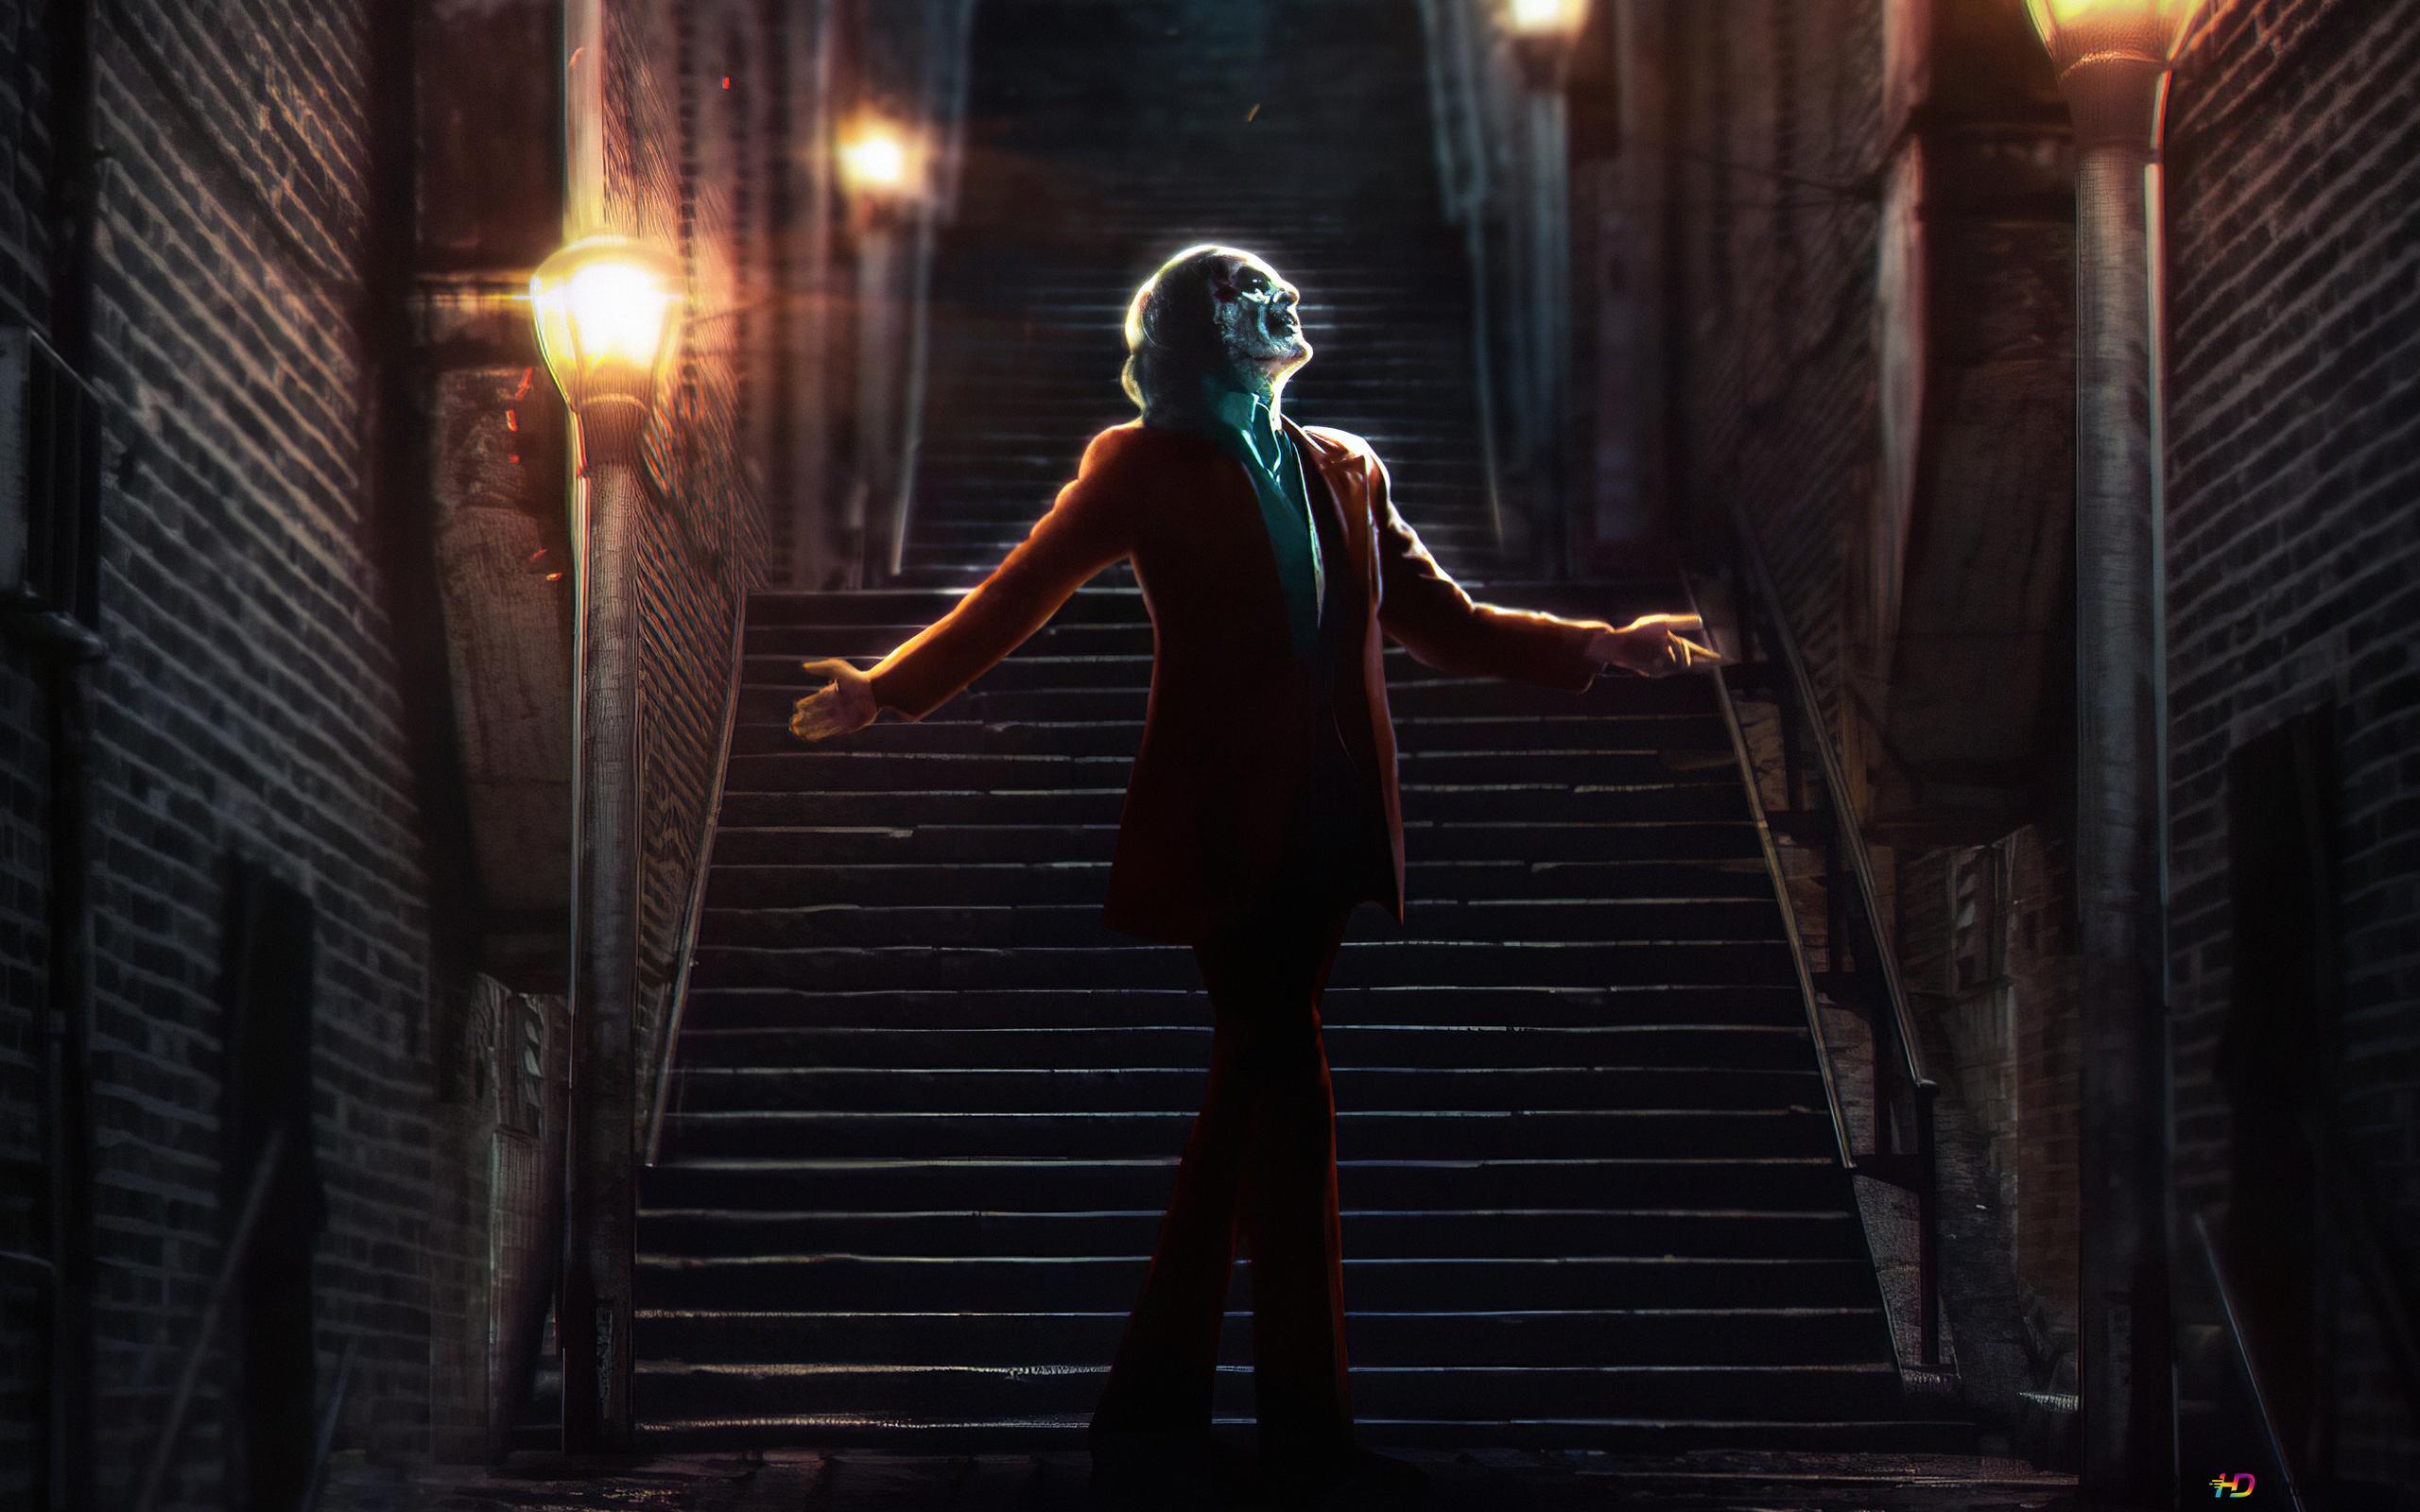 Joker The Movie Hd Wallpaper Download